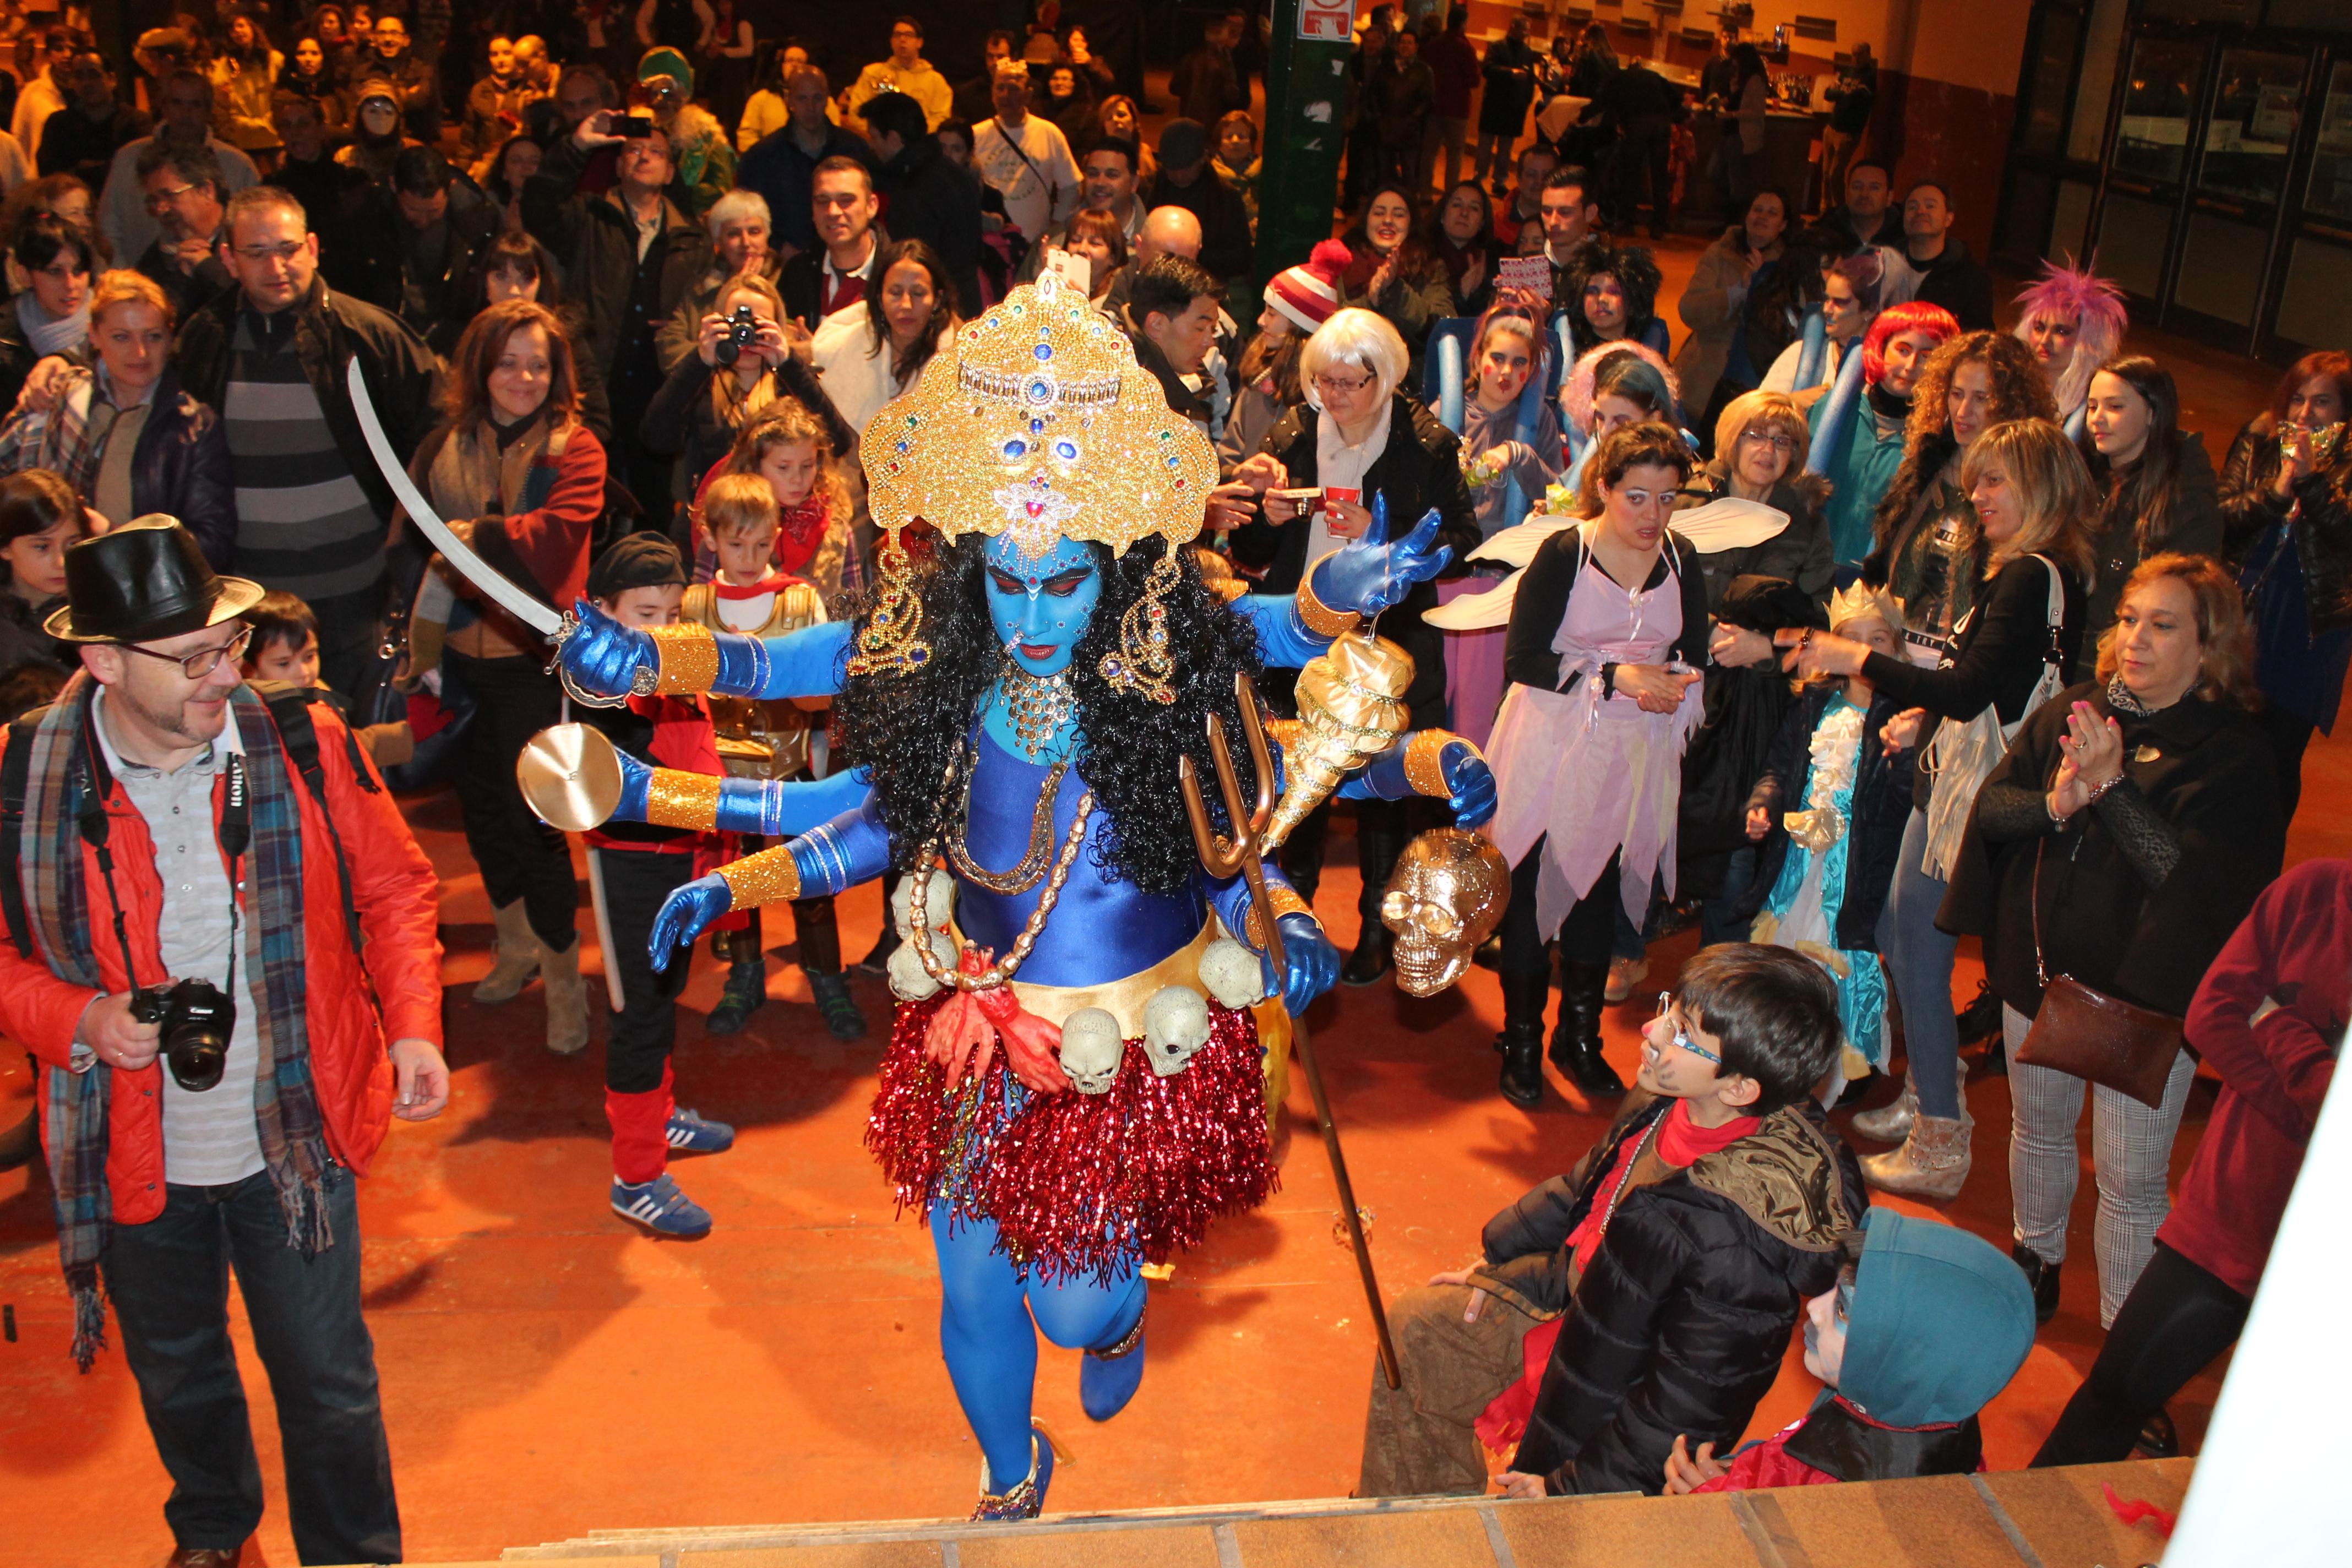 2015-02-14 Carnaval (83)